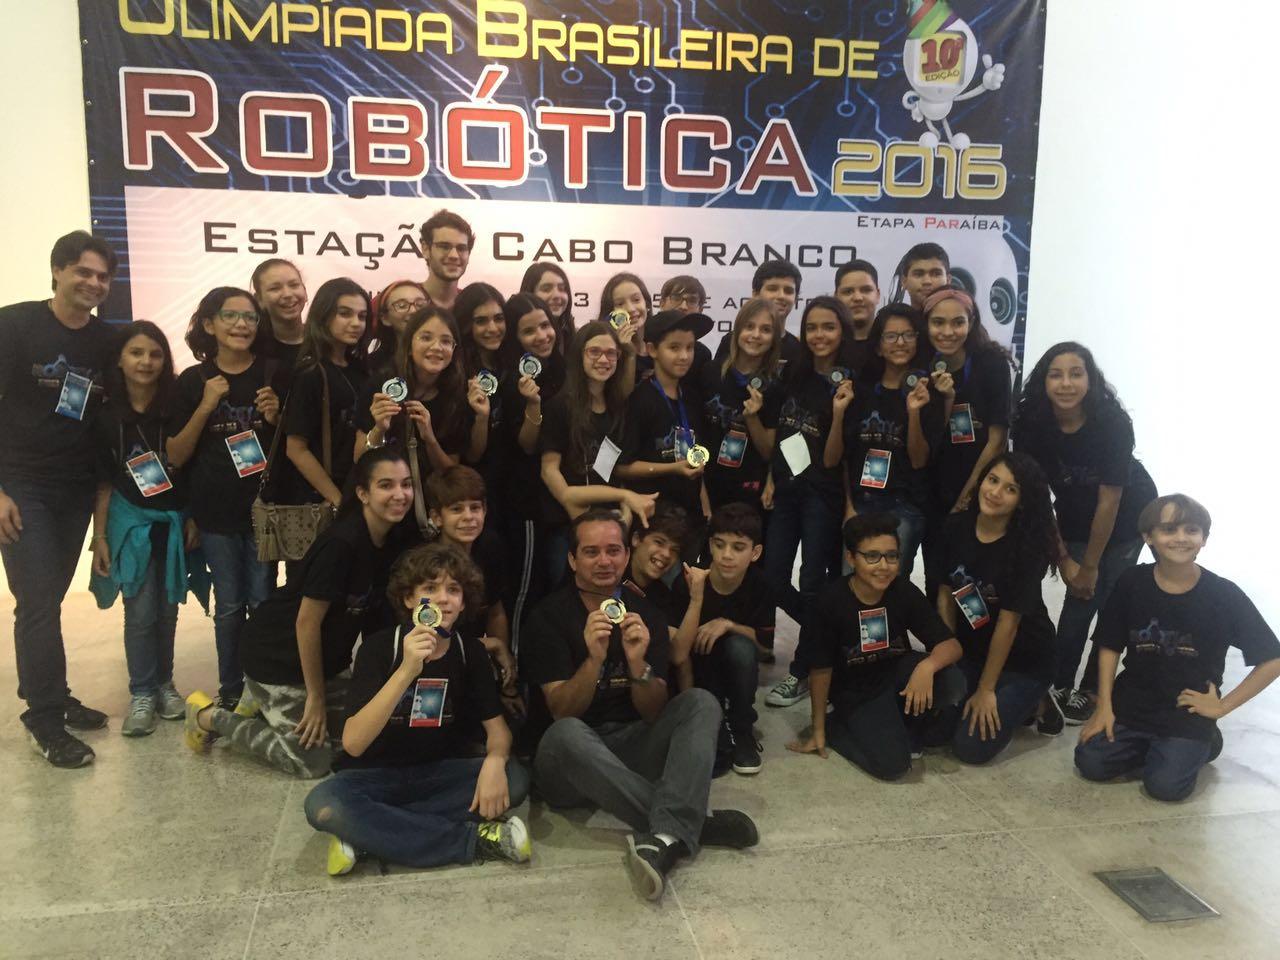 Olimpíada Brasileira de Robótica